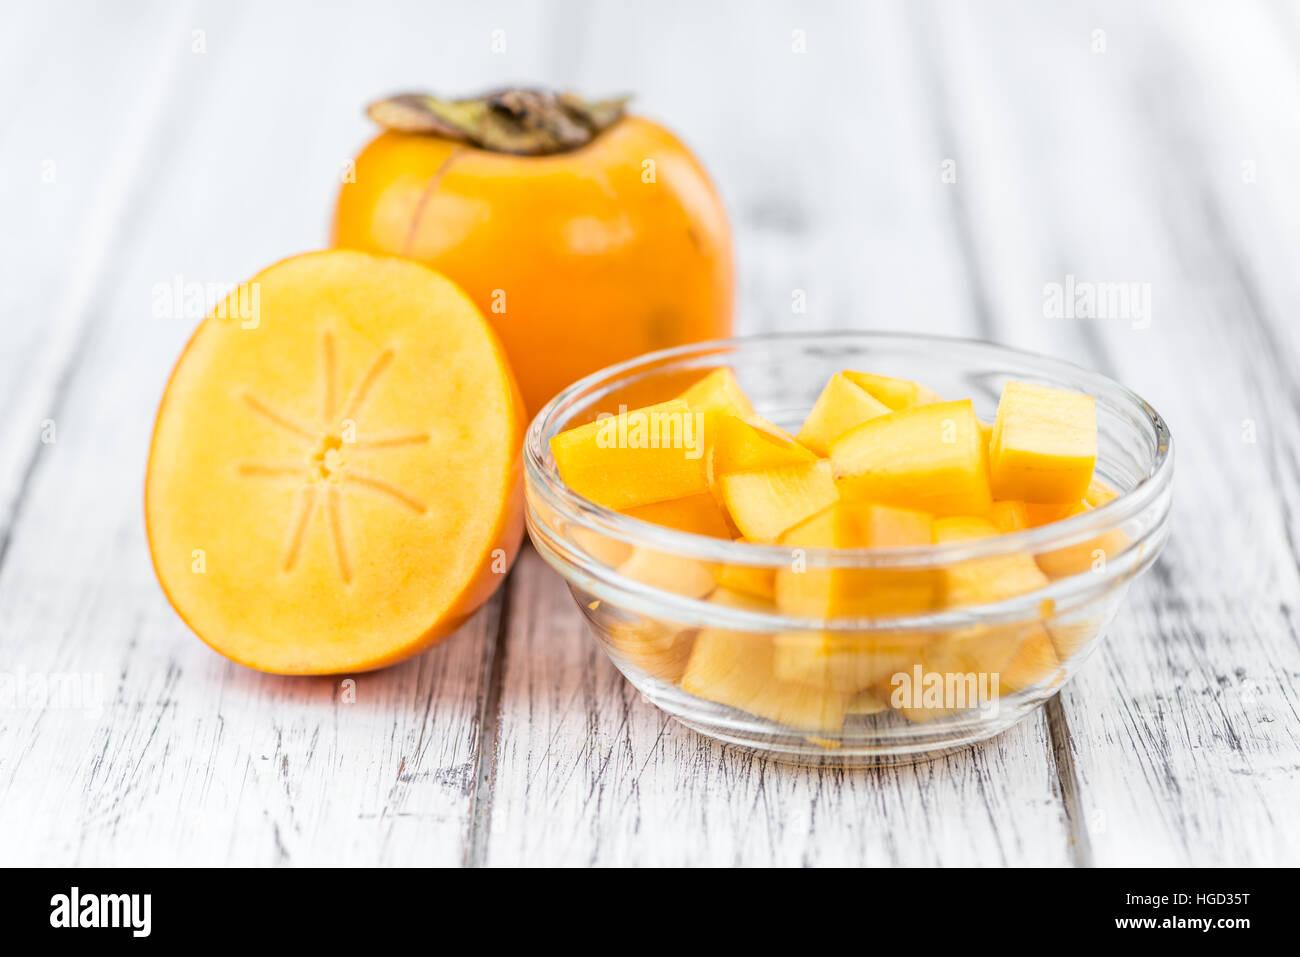 Portion of fresh made Kaki fruits (close-up shot; selective focus) - Stock Image